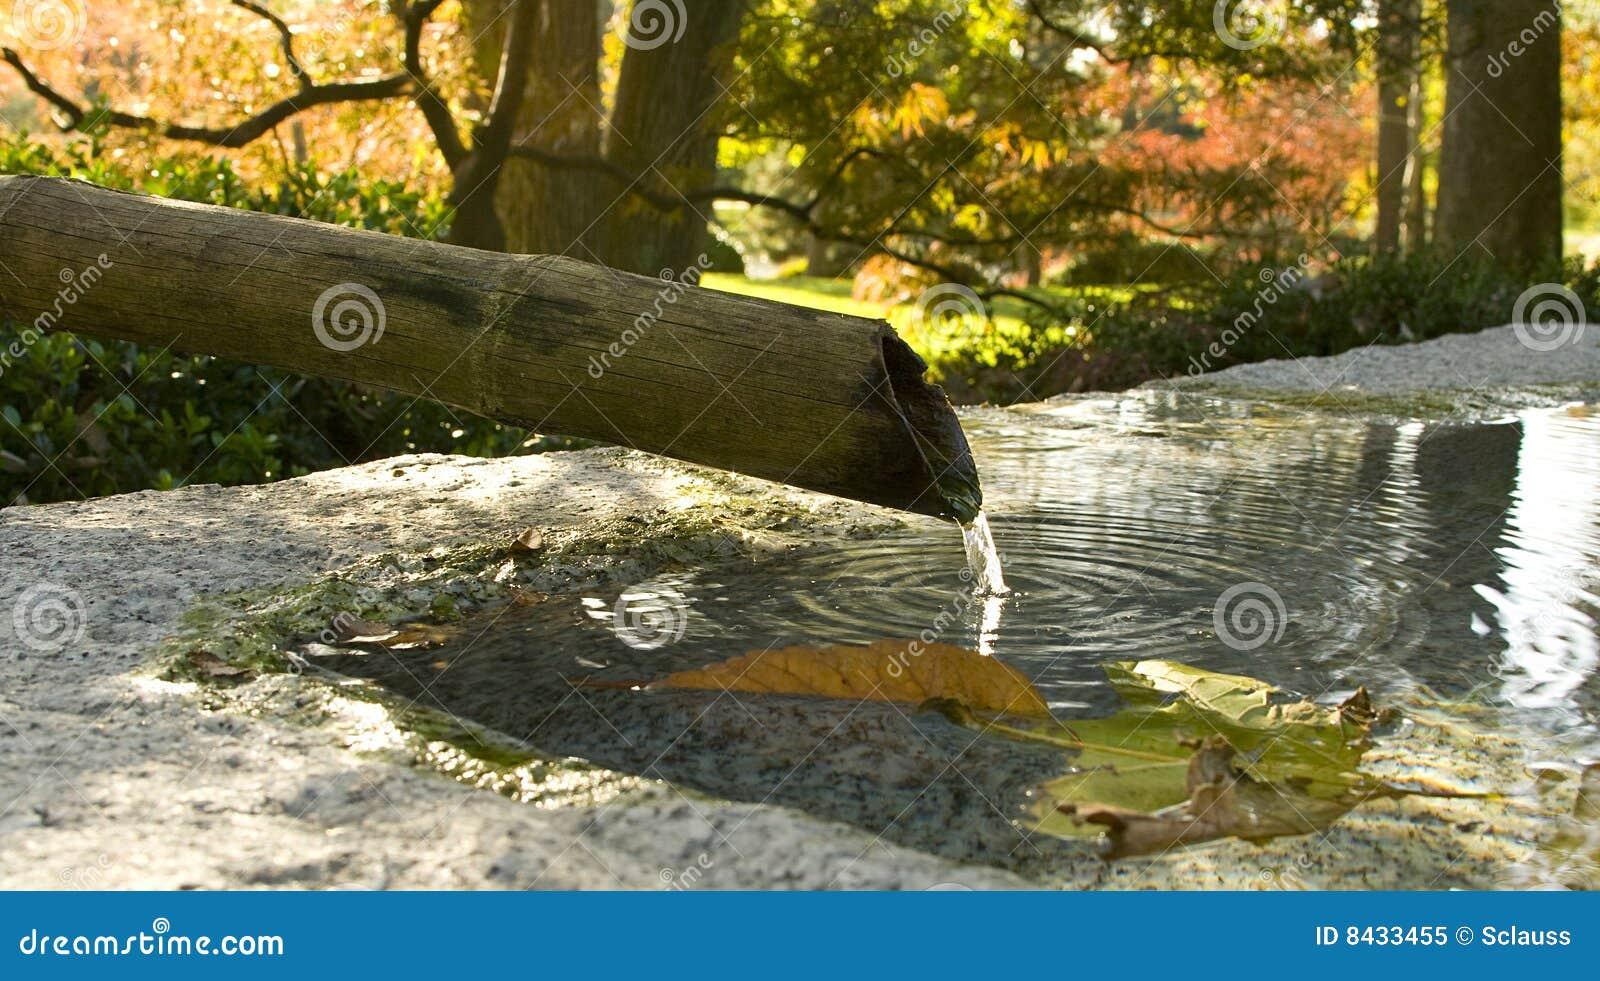 Bamboo Fountain in Autumn